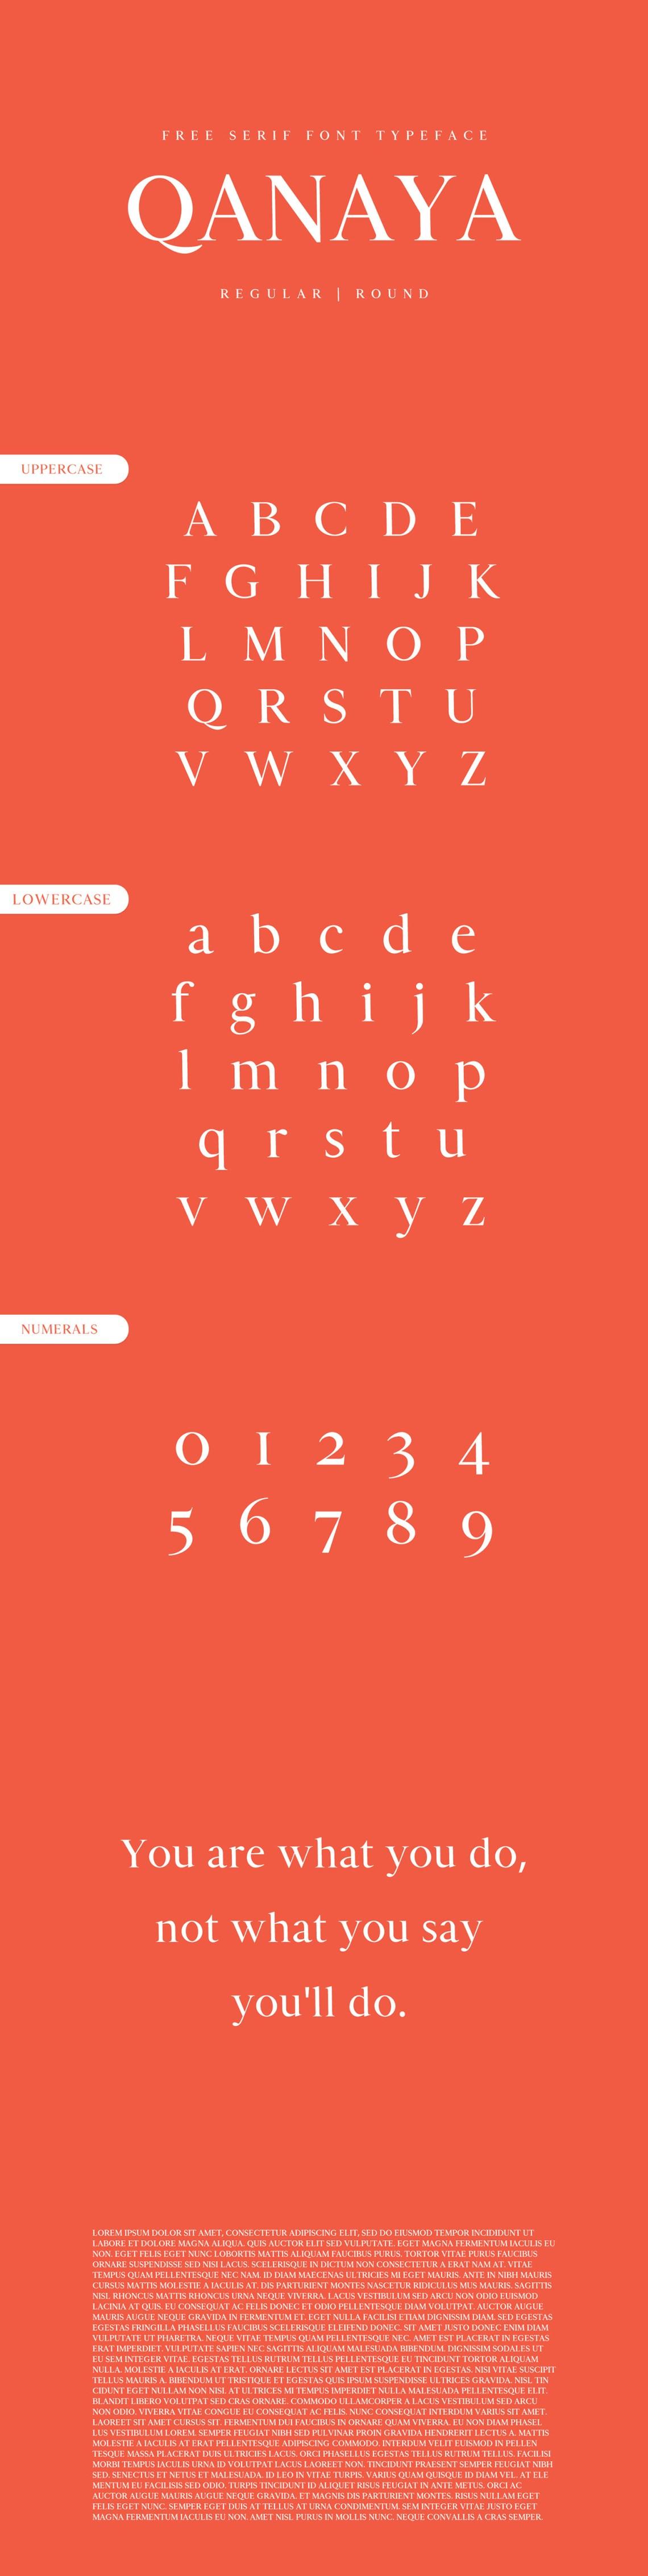 Download Free Qanaya Serif Font Family Pack on Behance